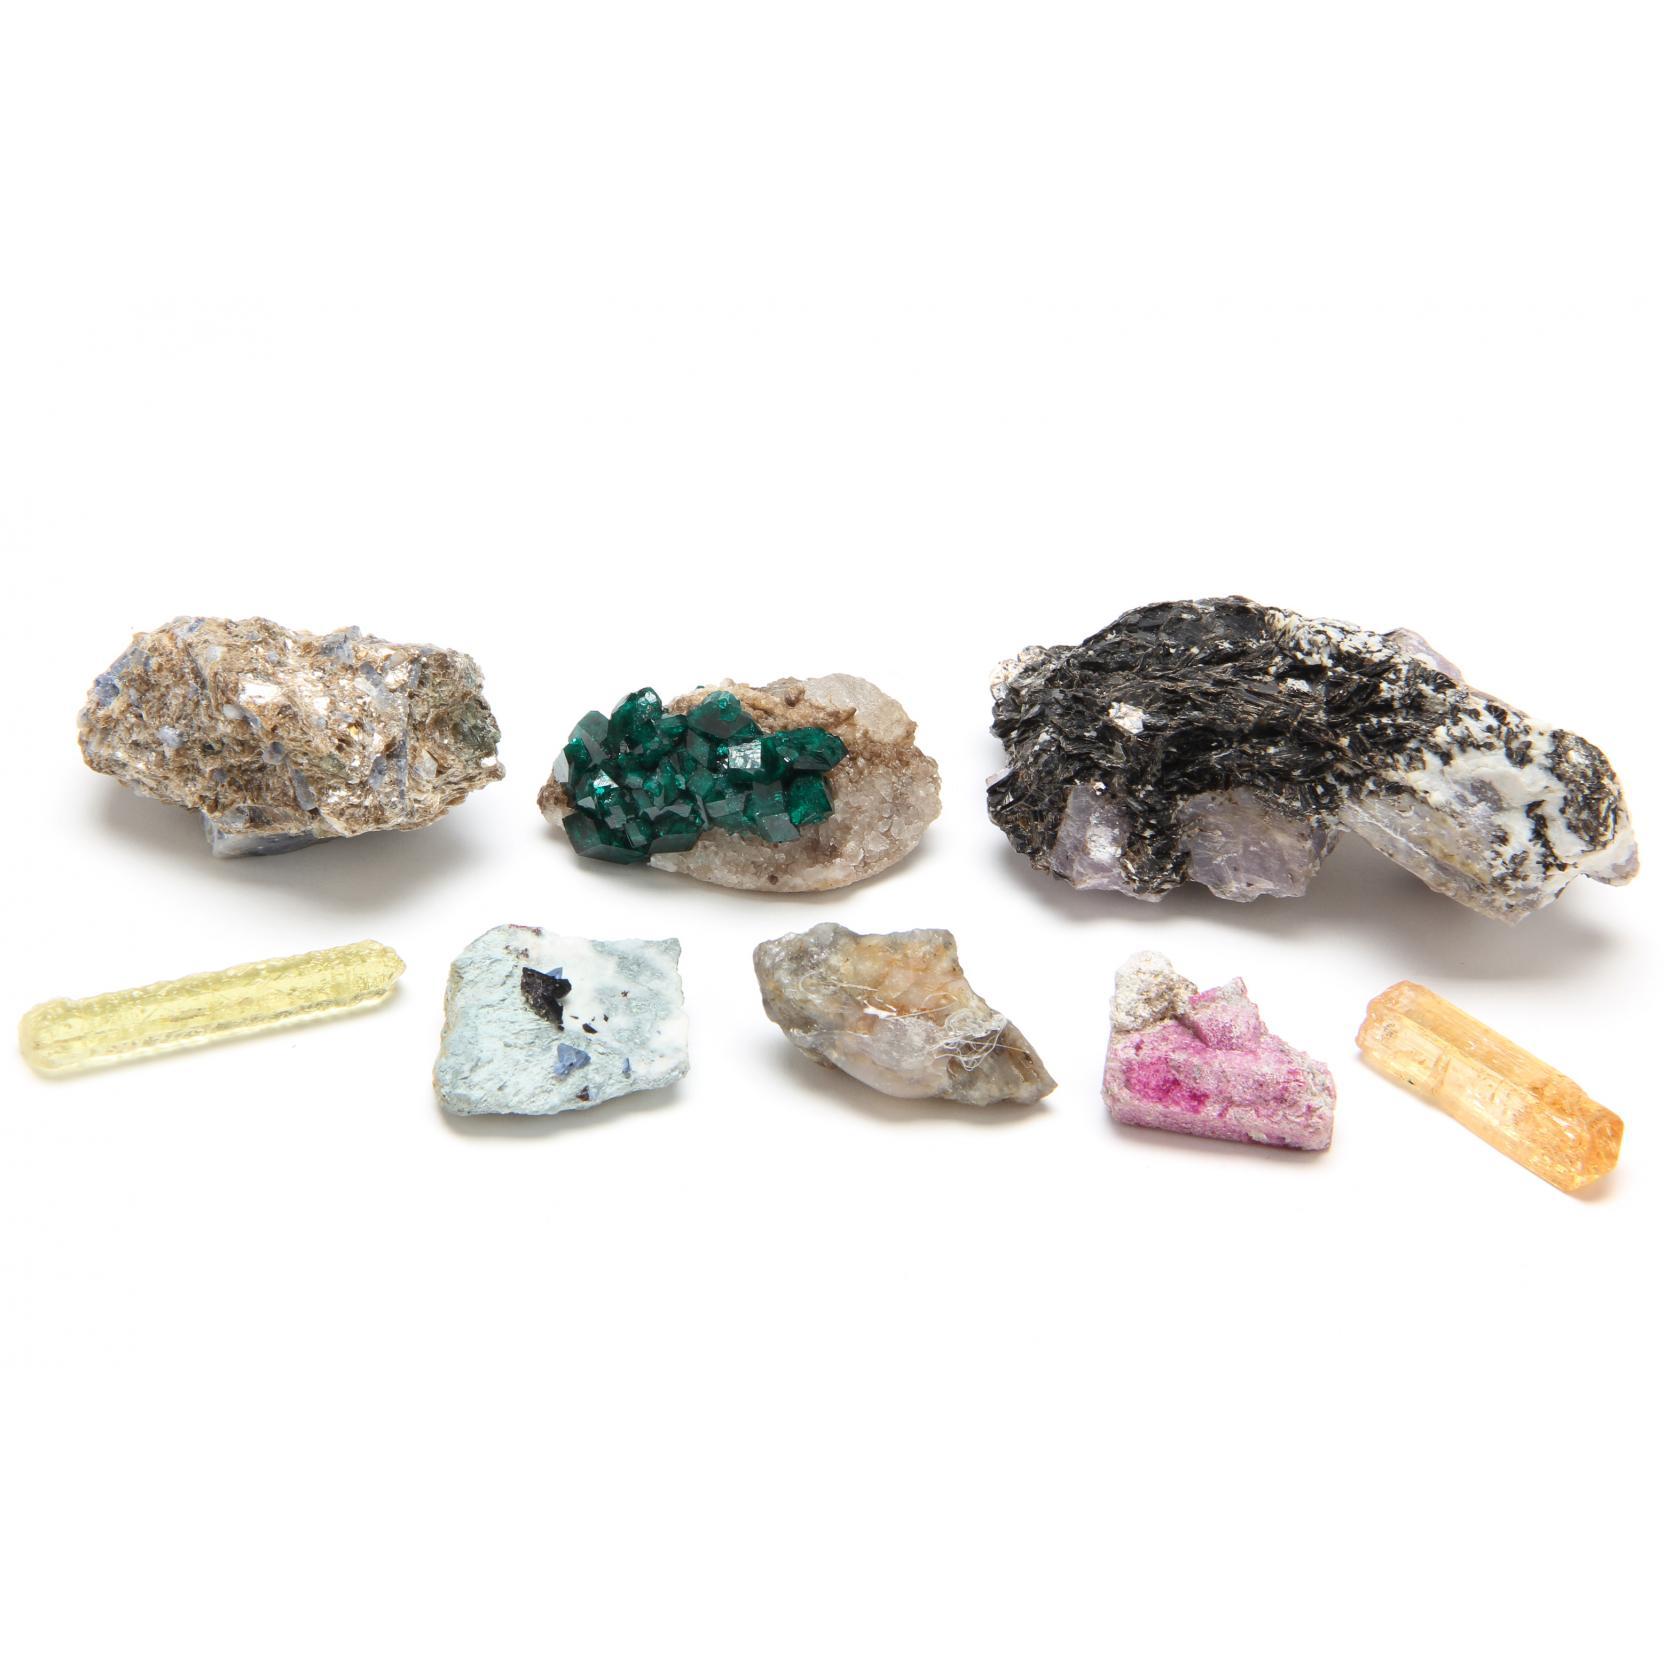 eight-raw-gem-specimens